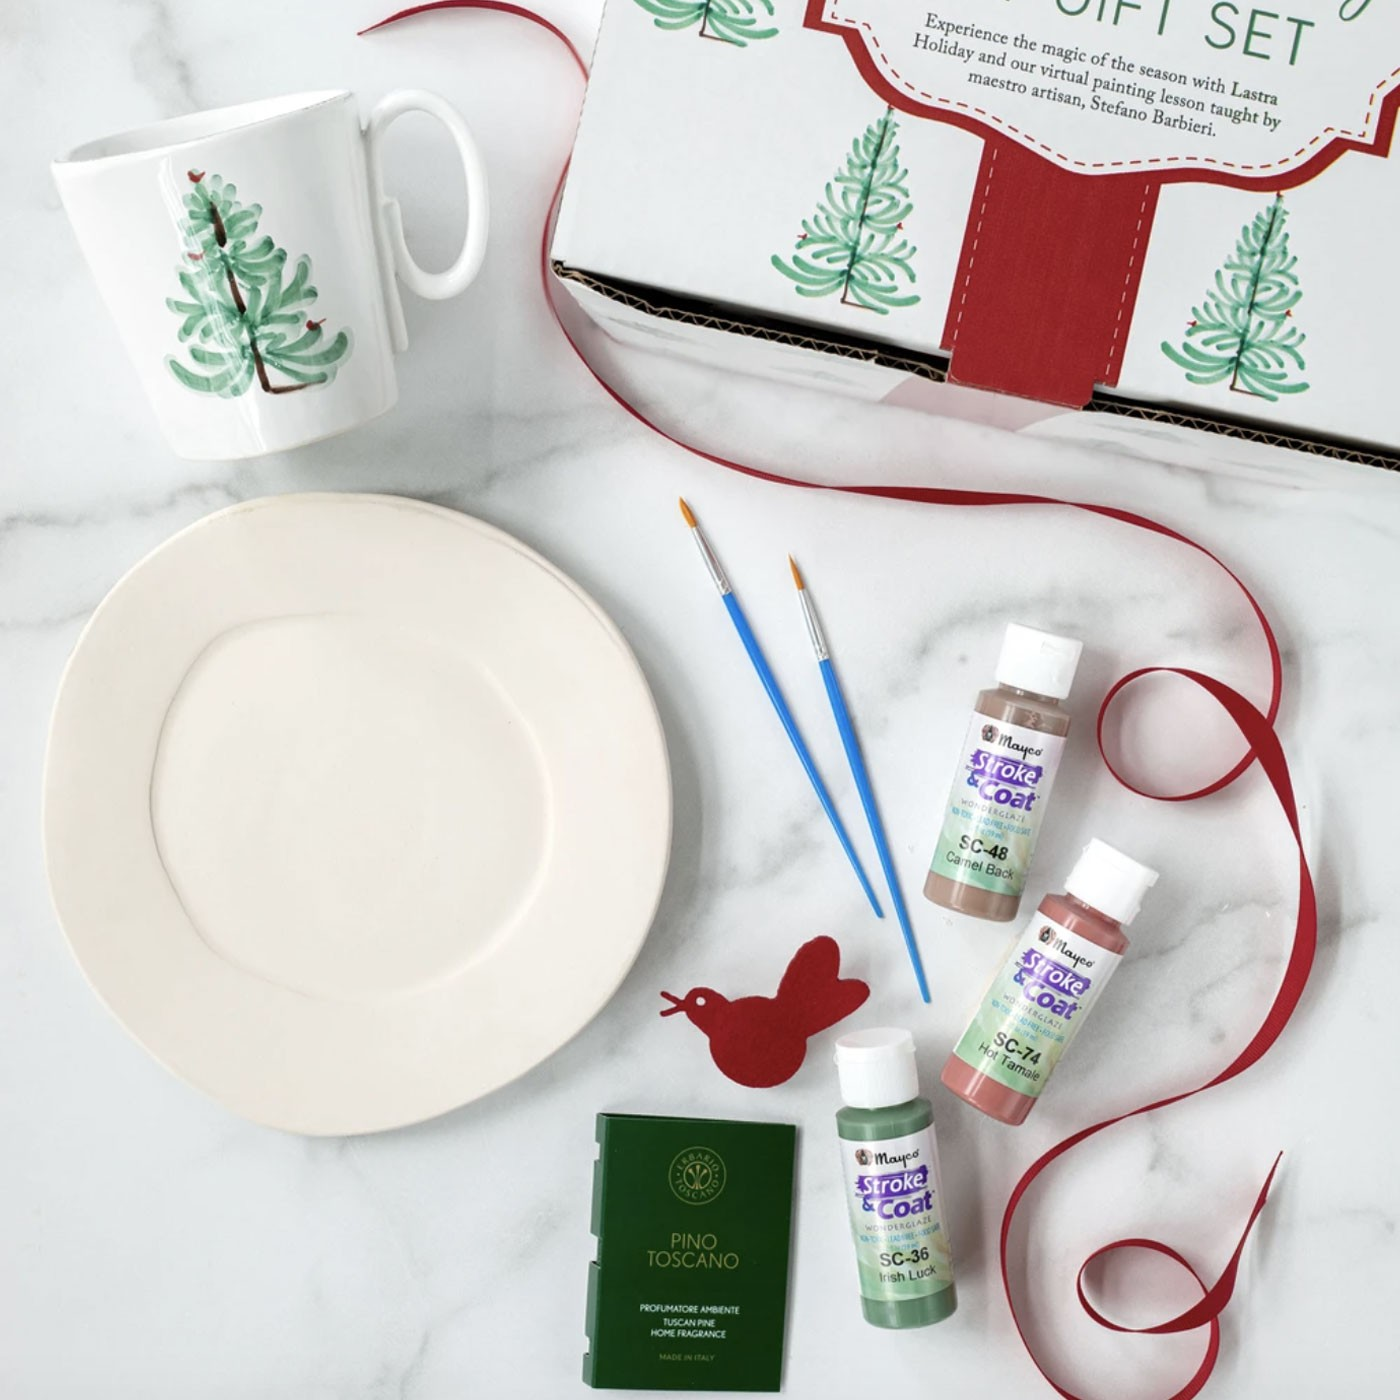 Lastra DIY Holiday Gift Set